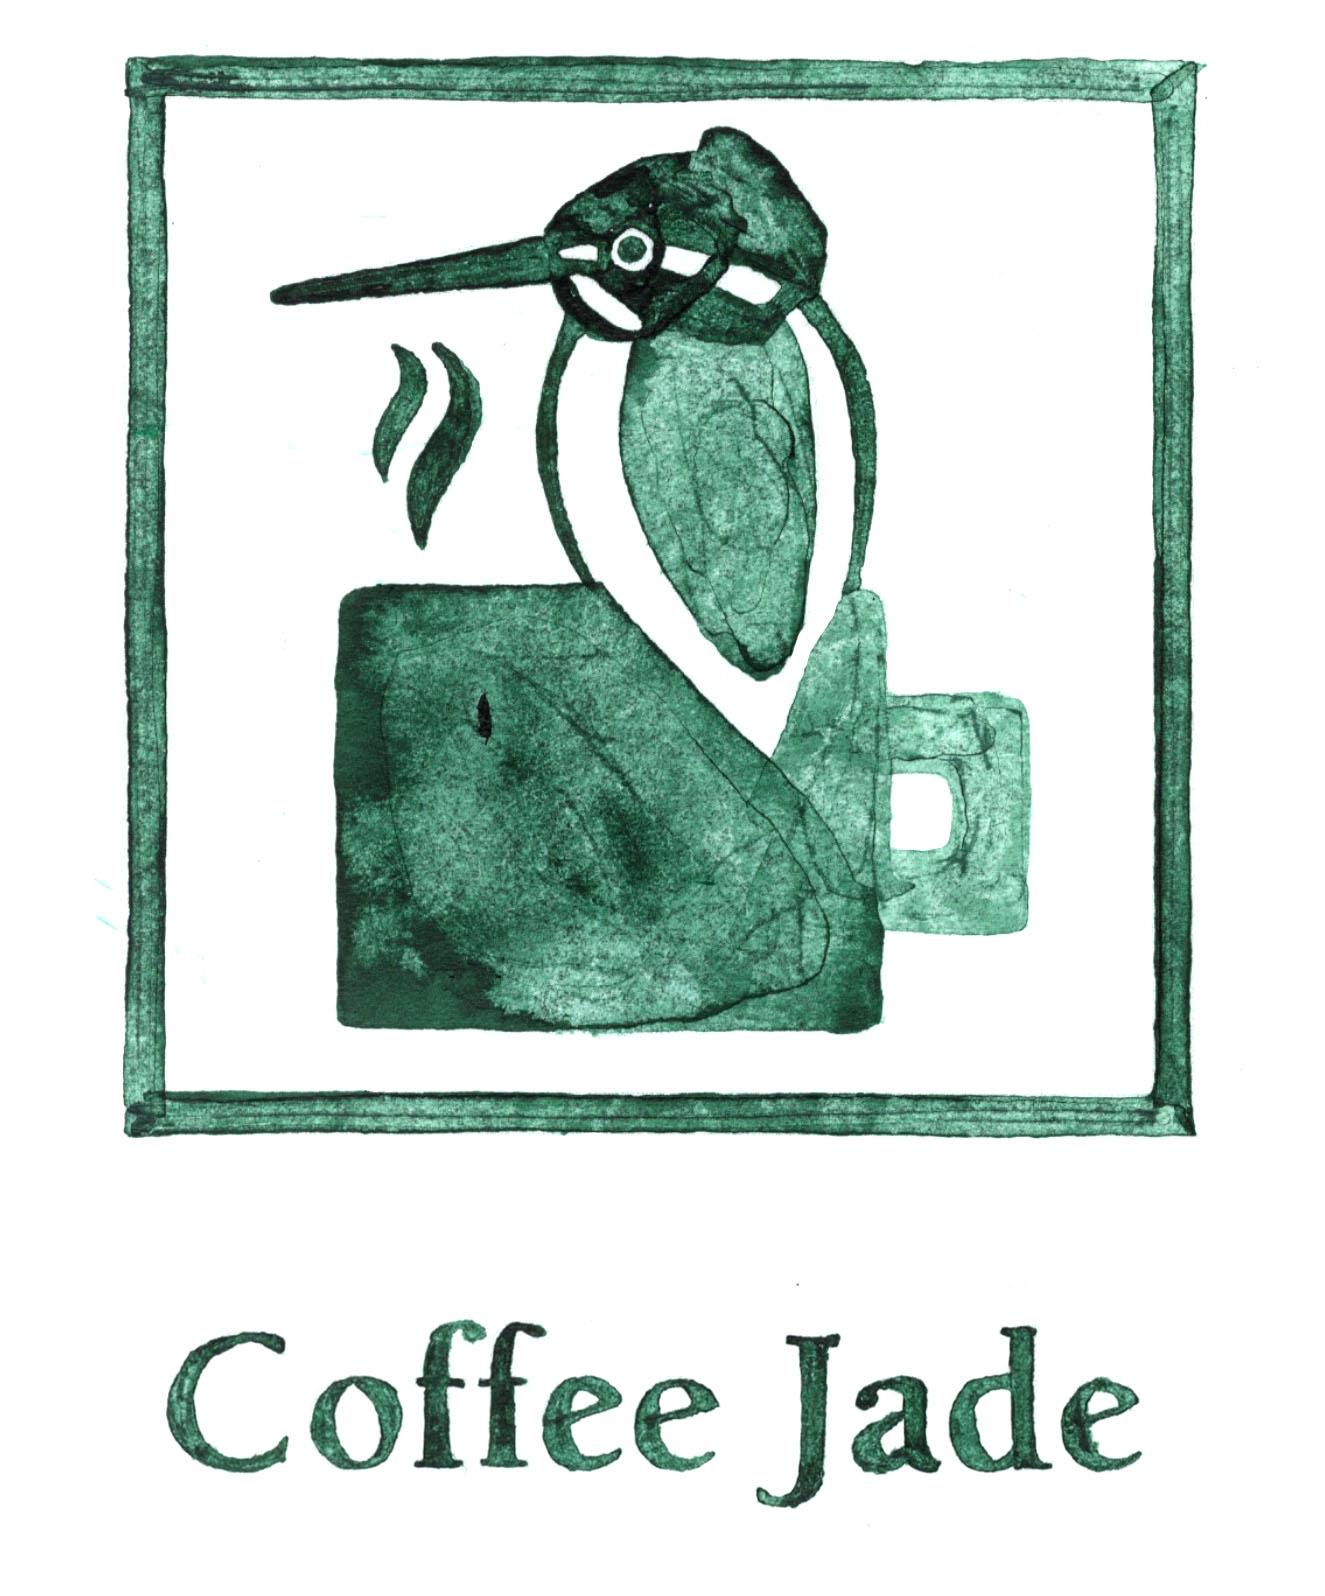 Coffee Jade